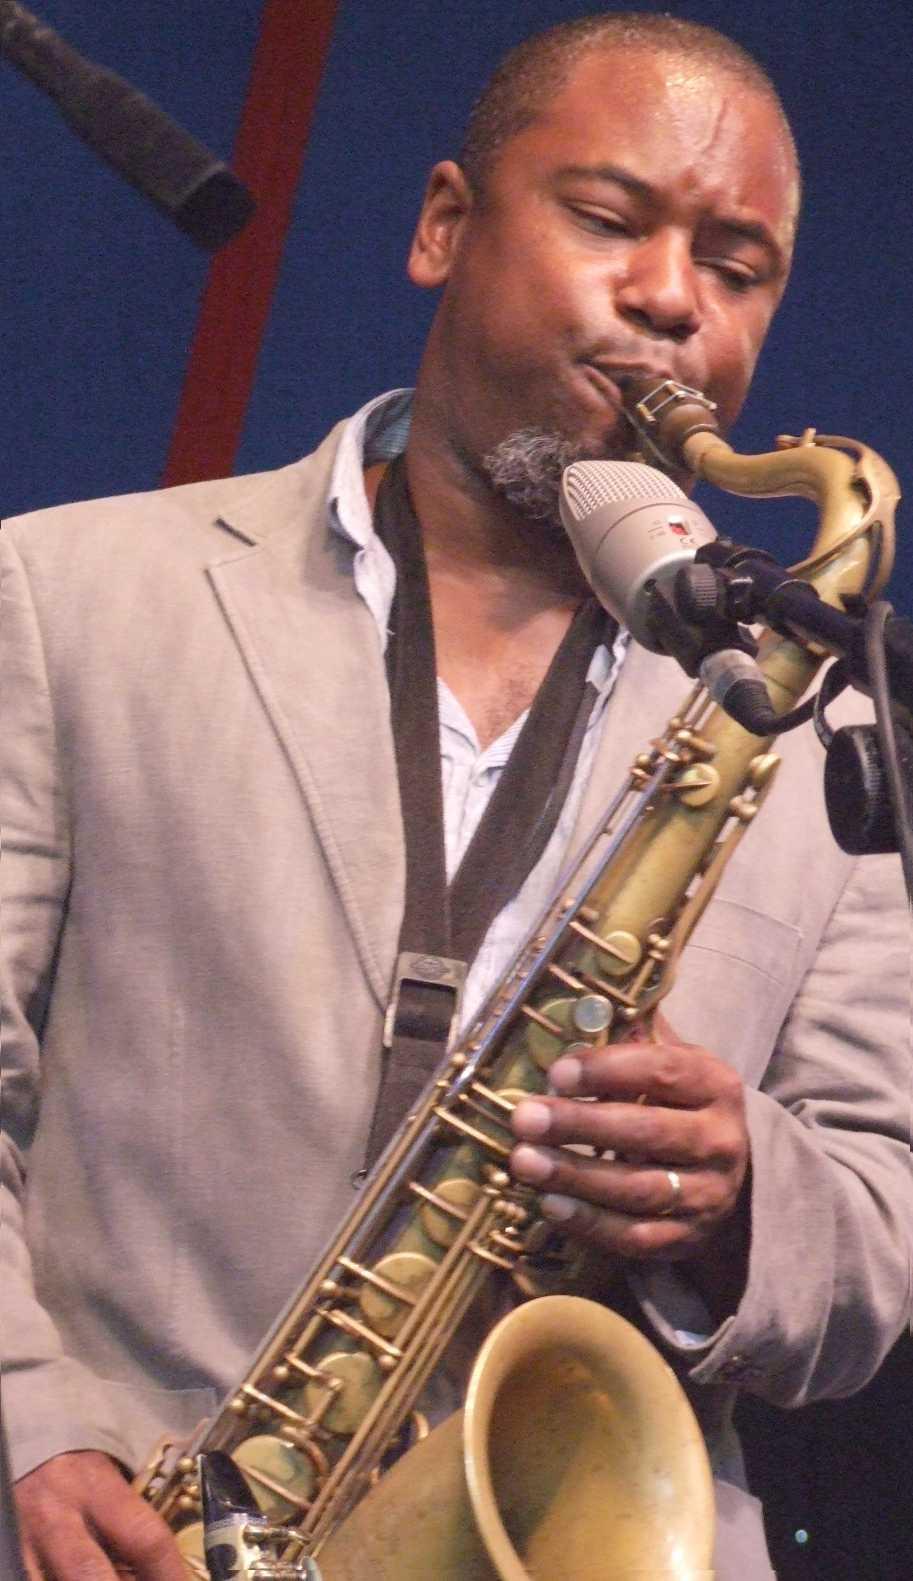 Denys Baptiste Leading His Quartet at 2009 Ealing Jazz Festival